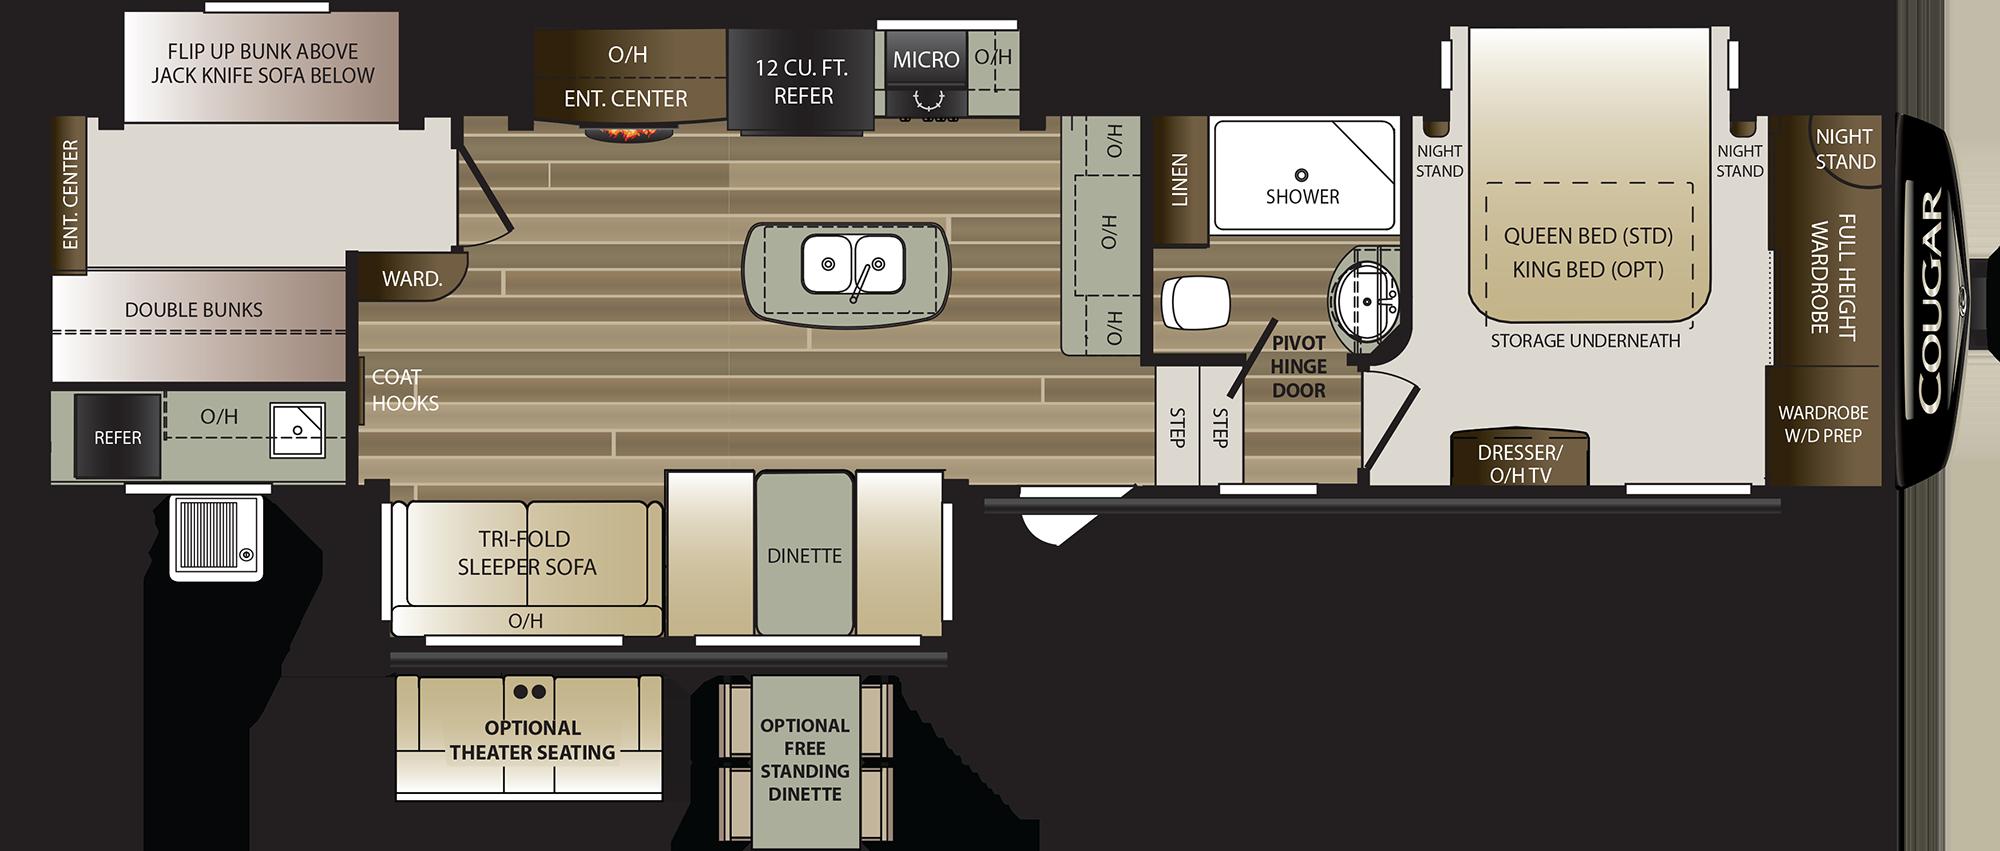 2019 KEYSTONE COUGAR 369BHS (bunks) Floorplan